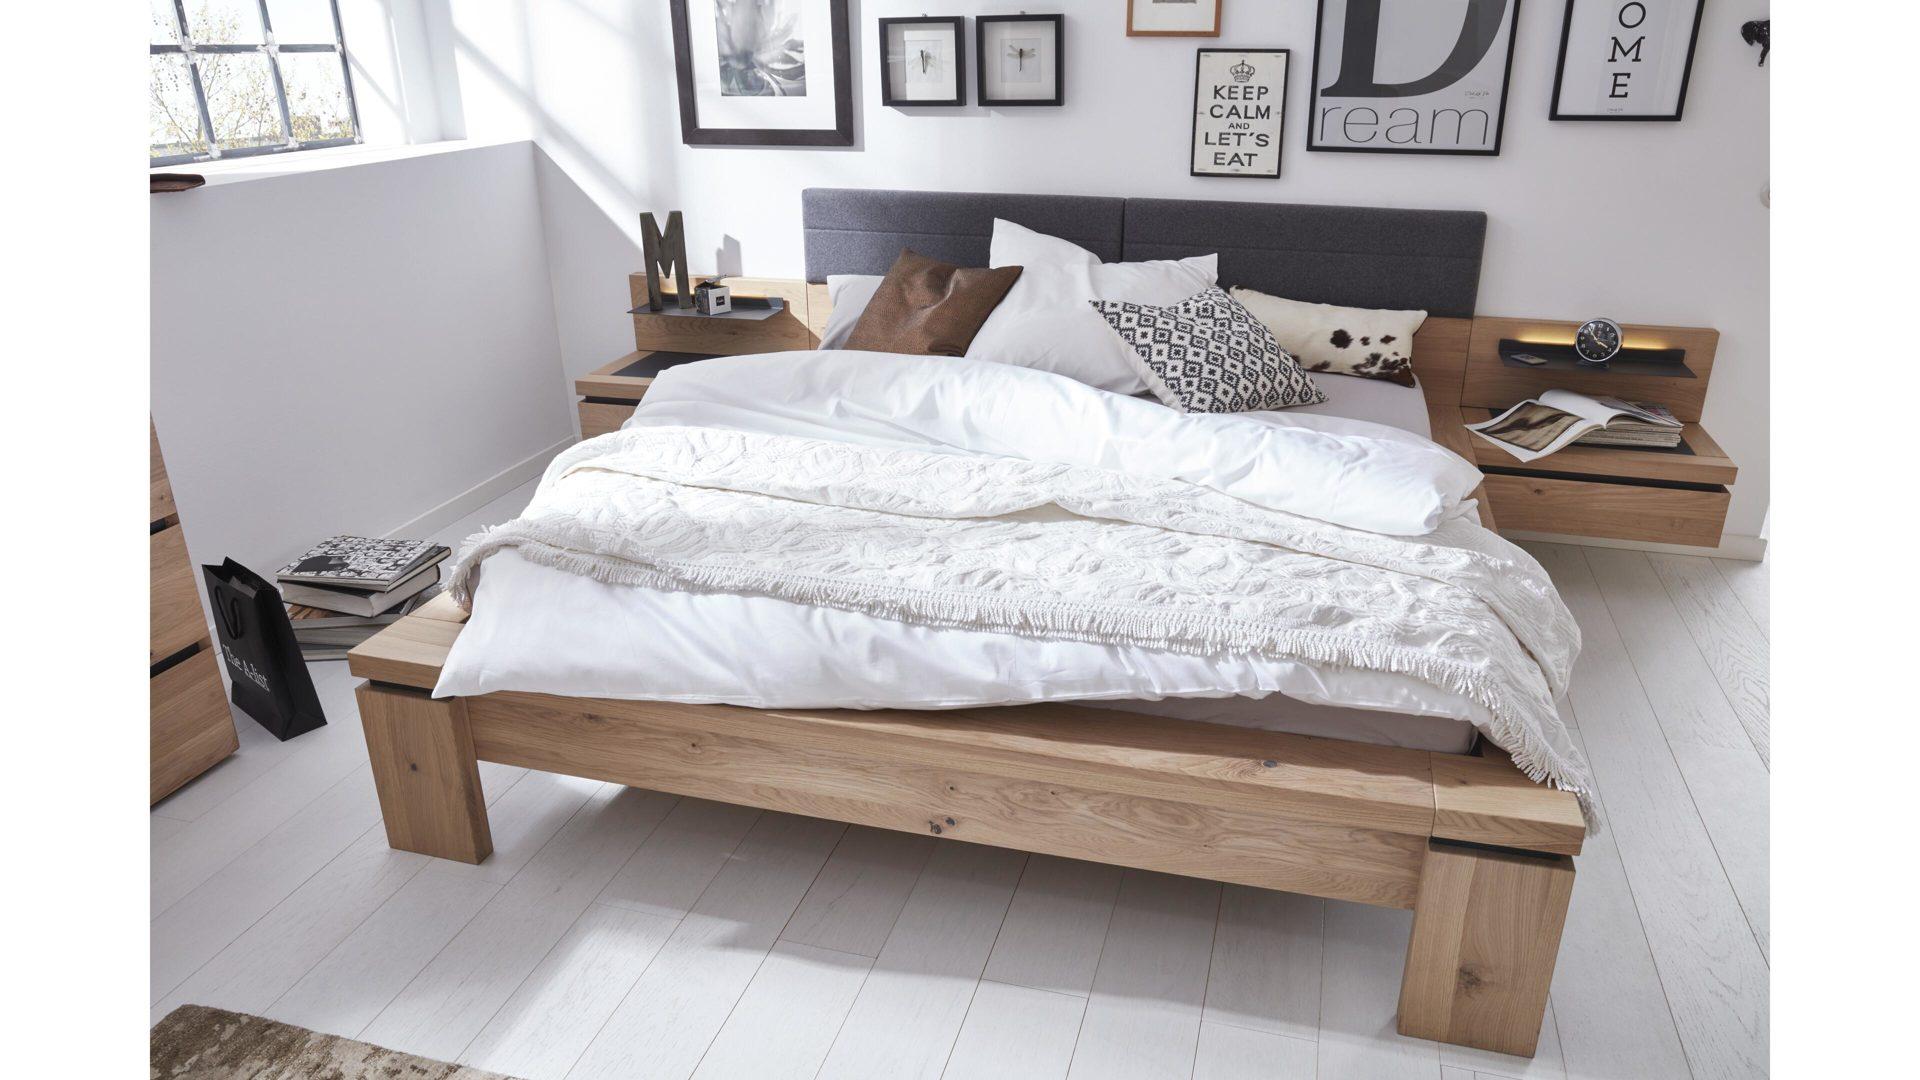 Mobel Boer Coesfeld Raume Schlafzimmer Betten Boxspringbett